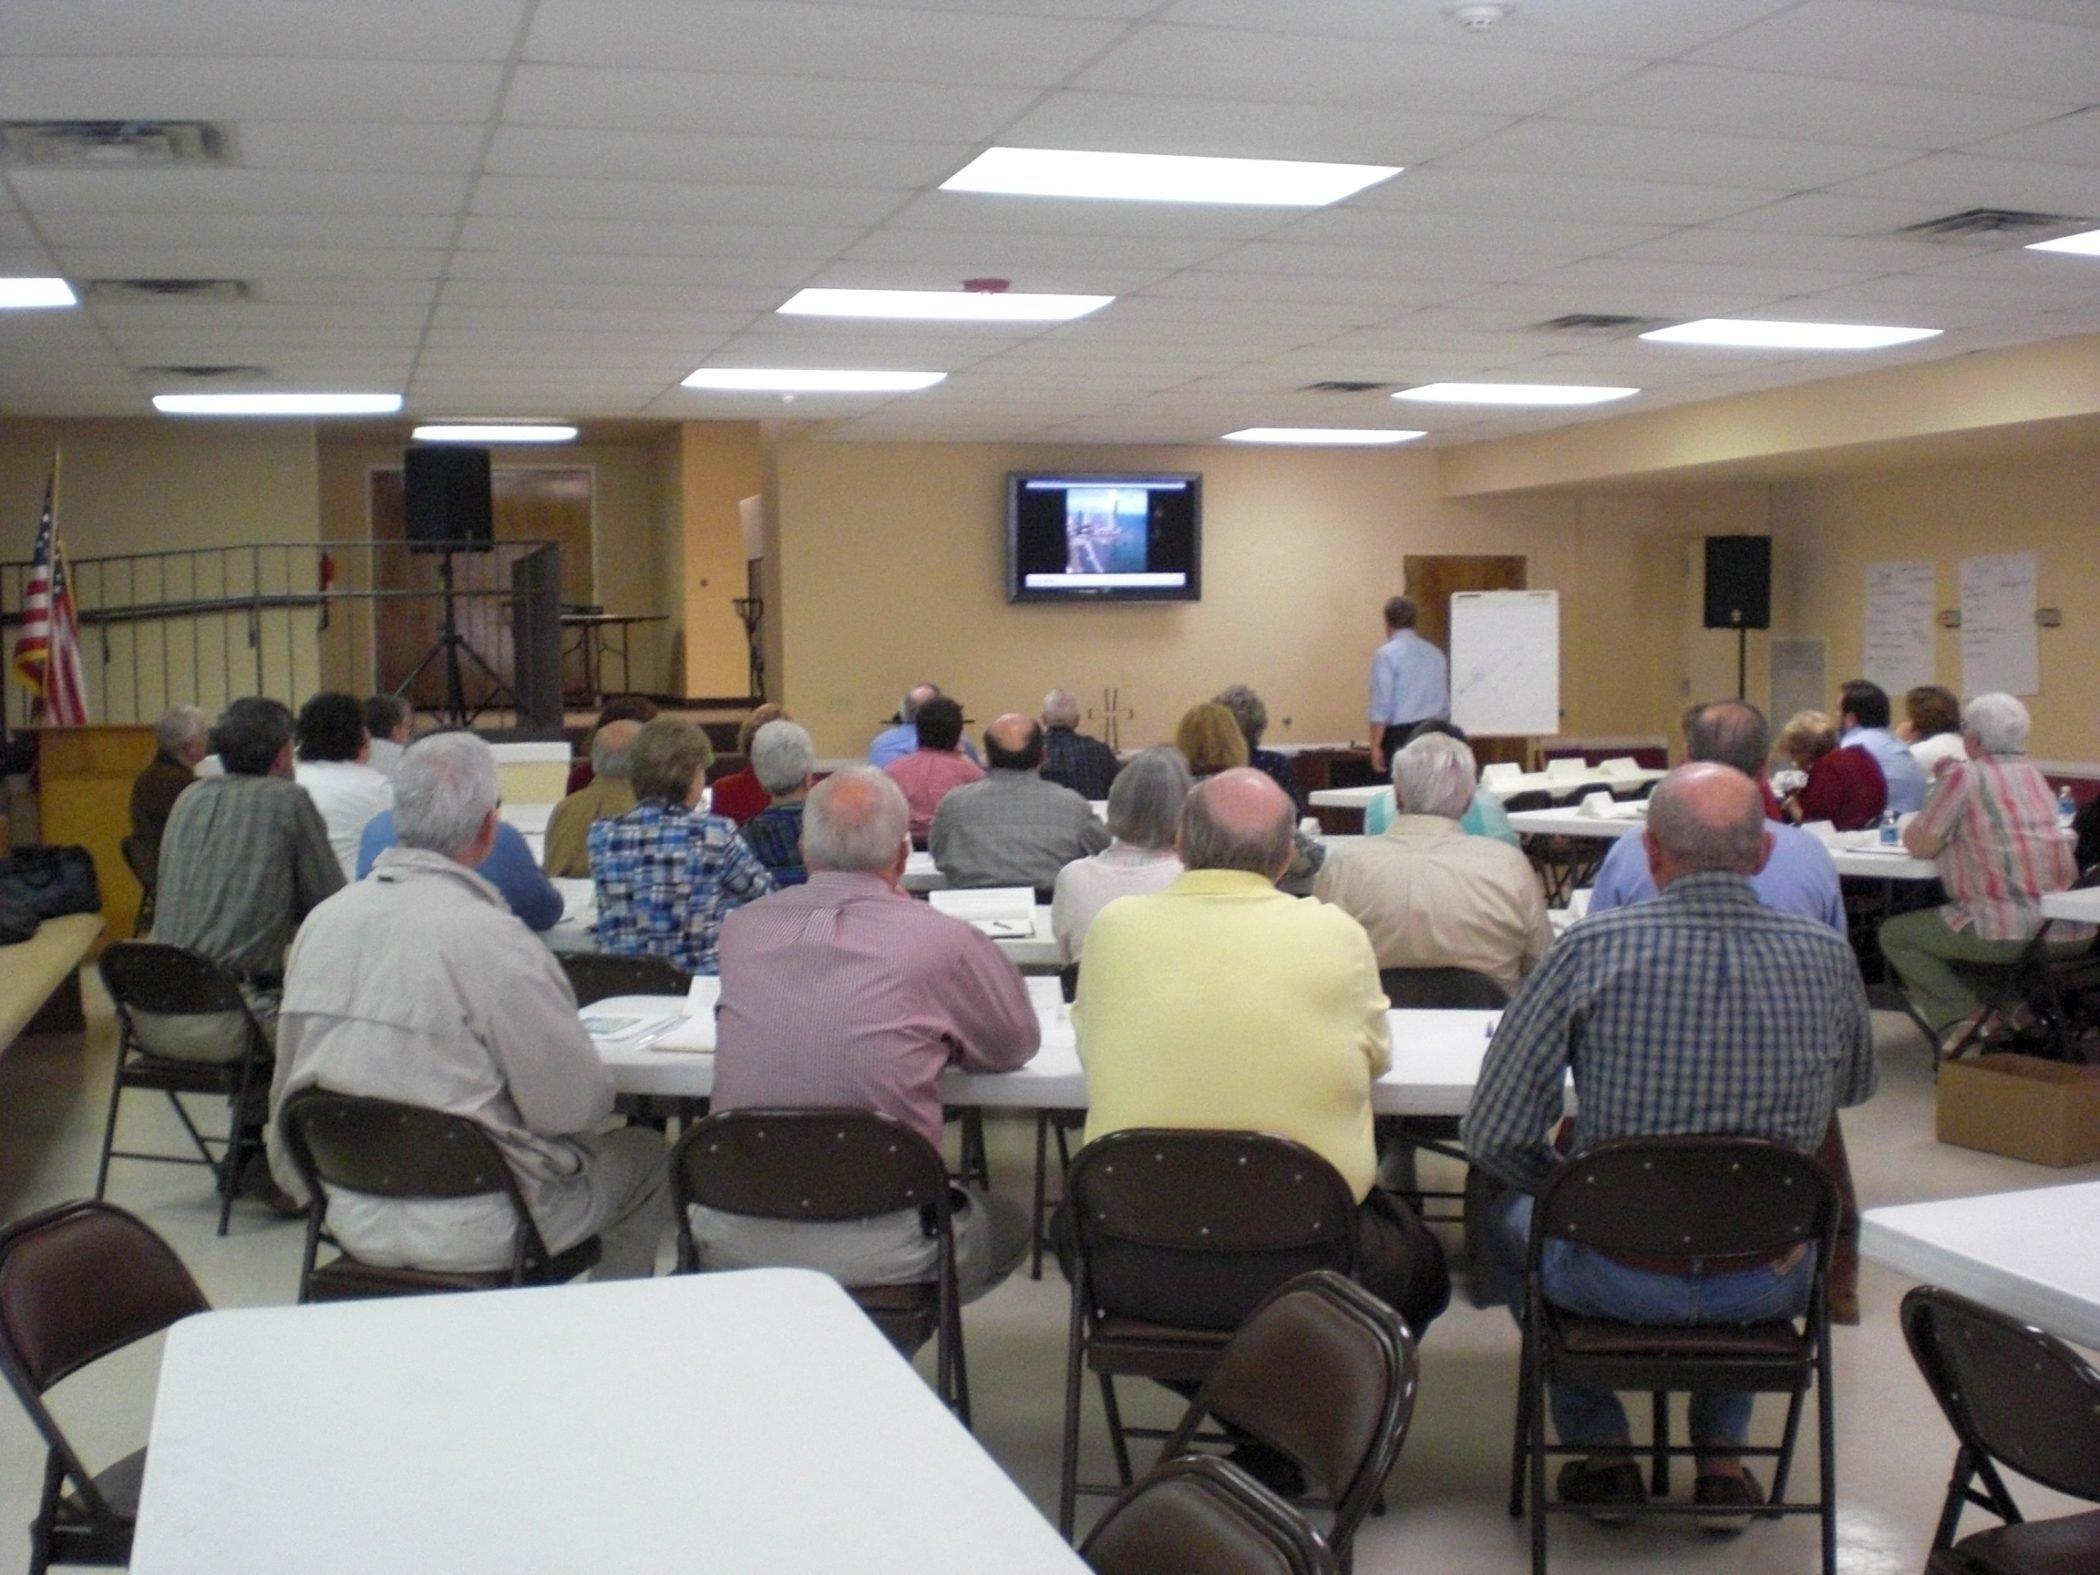 Pastor Evangelism Training in the church